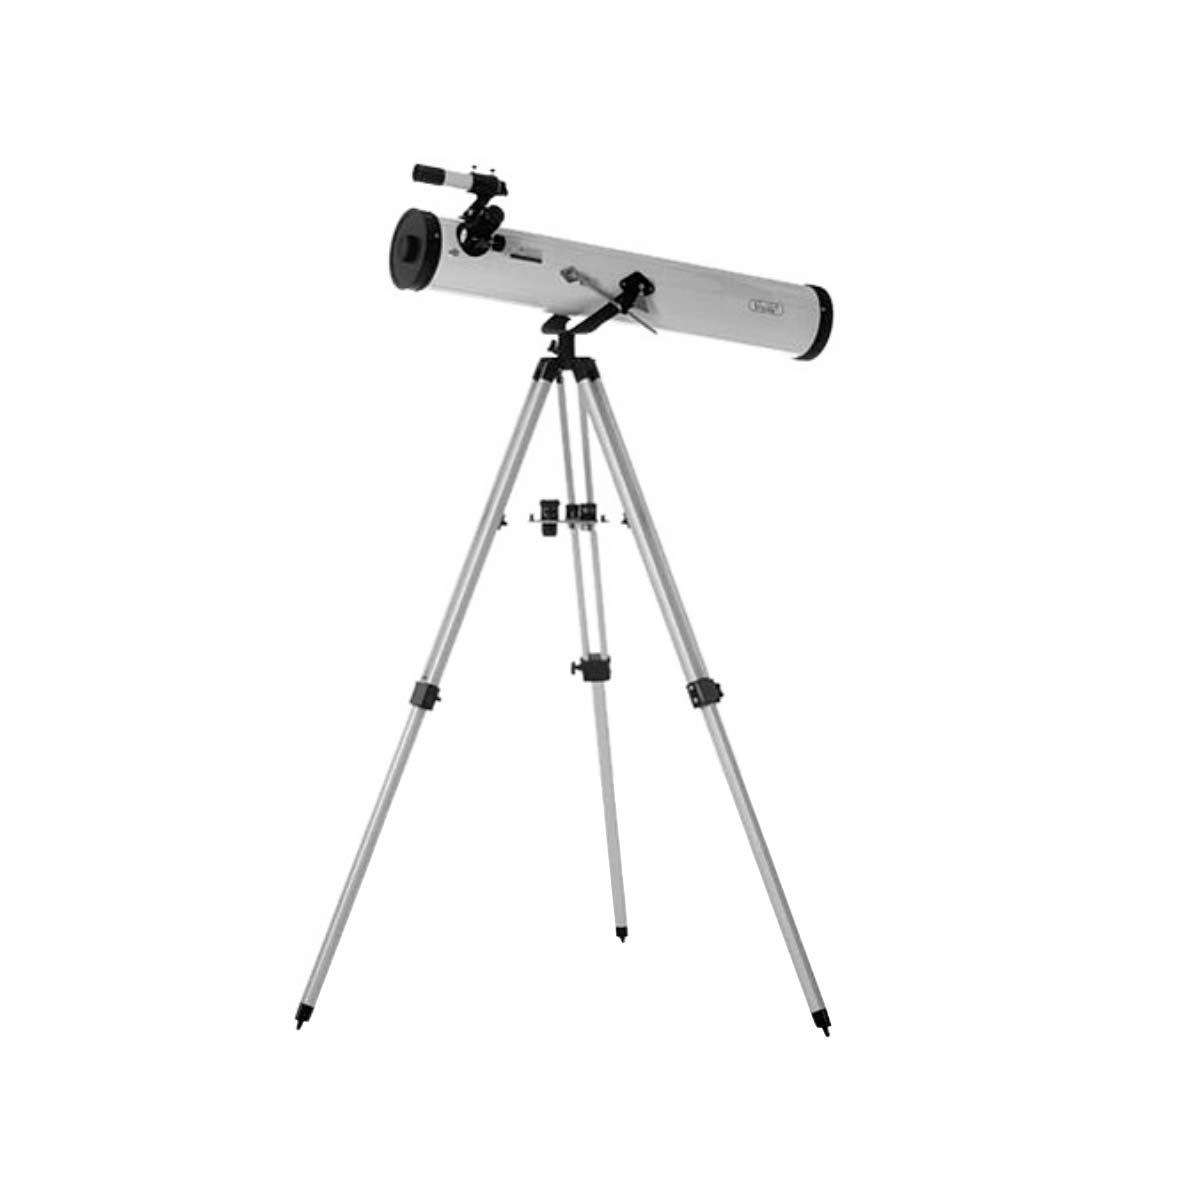 F900114A - Telescópio 114mm c/ Tripé F900 114A - CSR